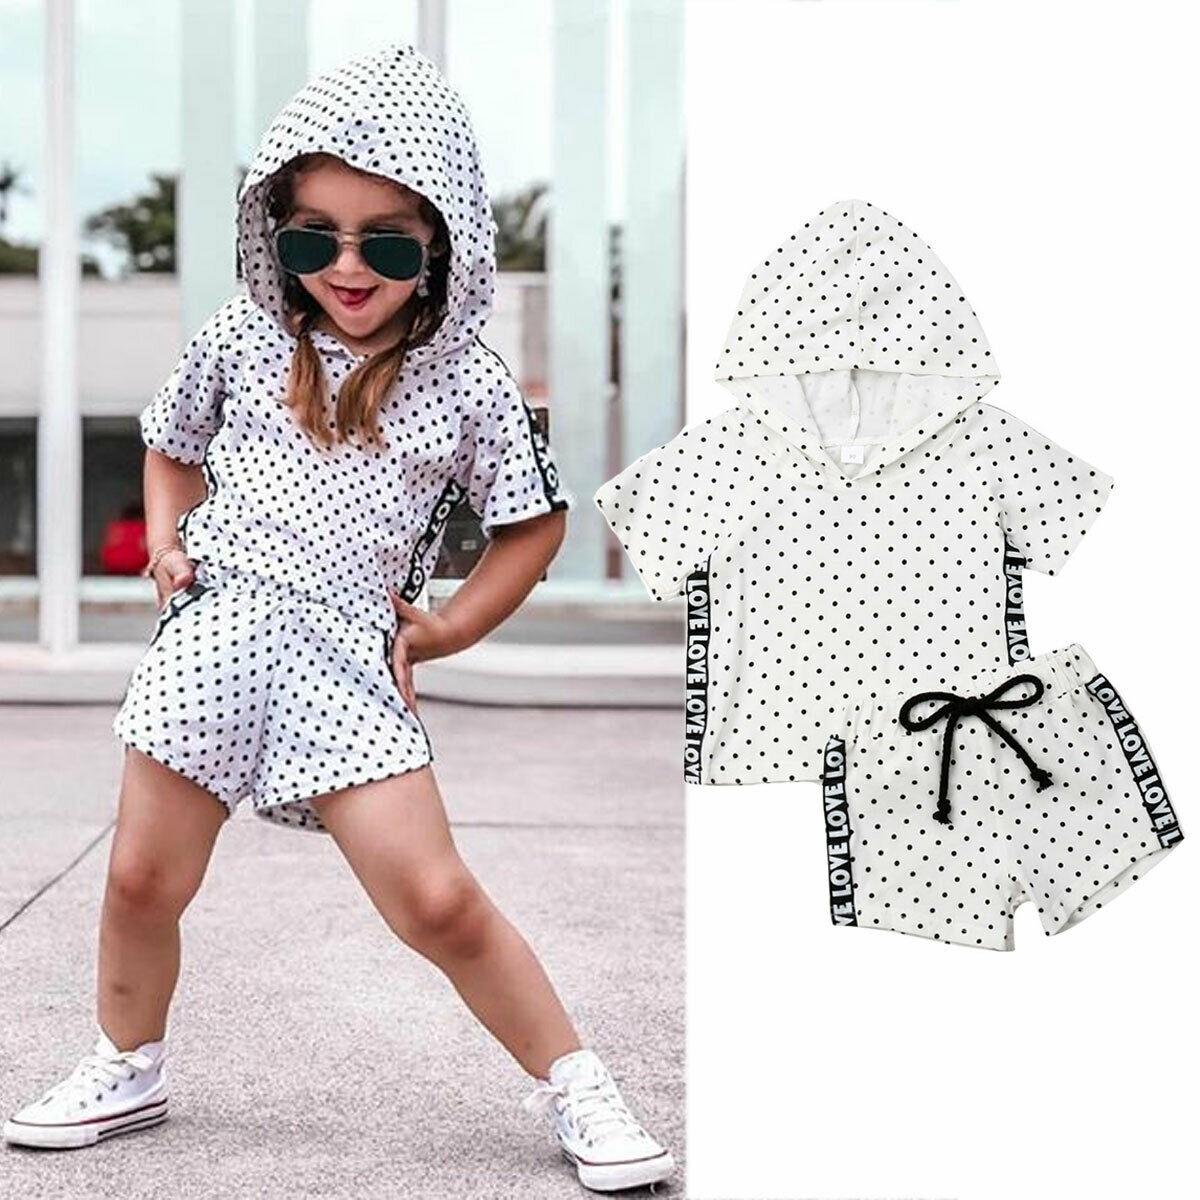 Kids Baby Girl HighTight Long Socks Fashion Fishnet Stockings Costume B/&S/&M Size